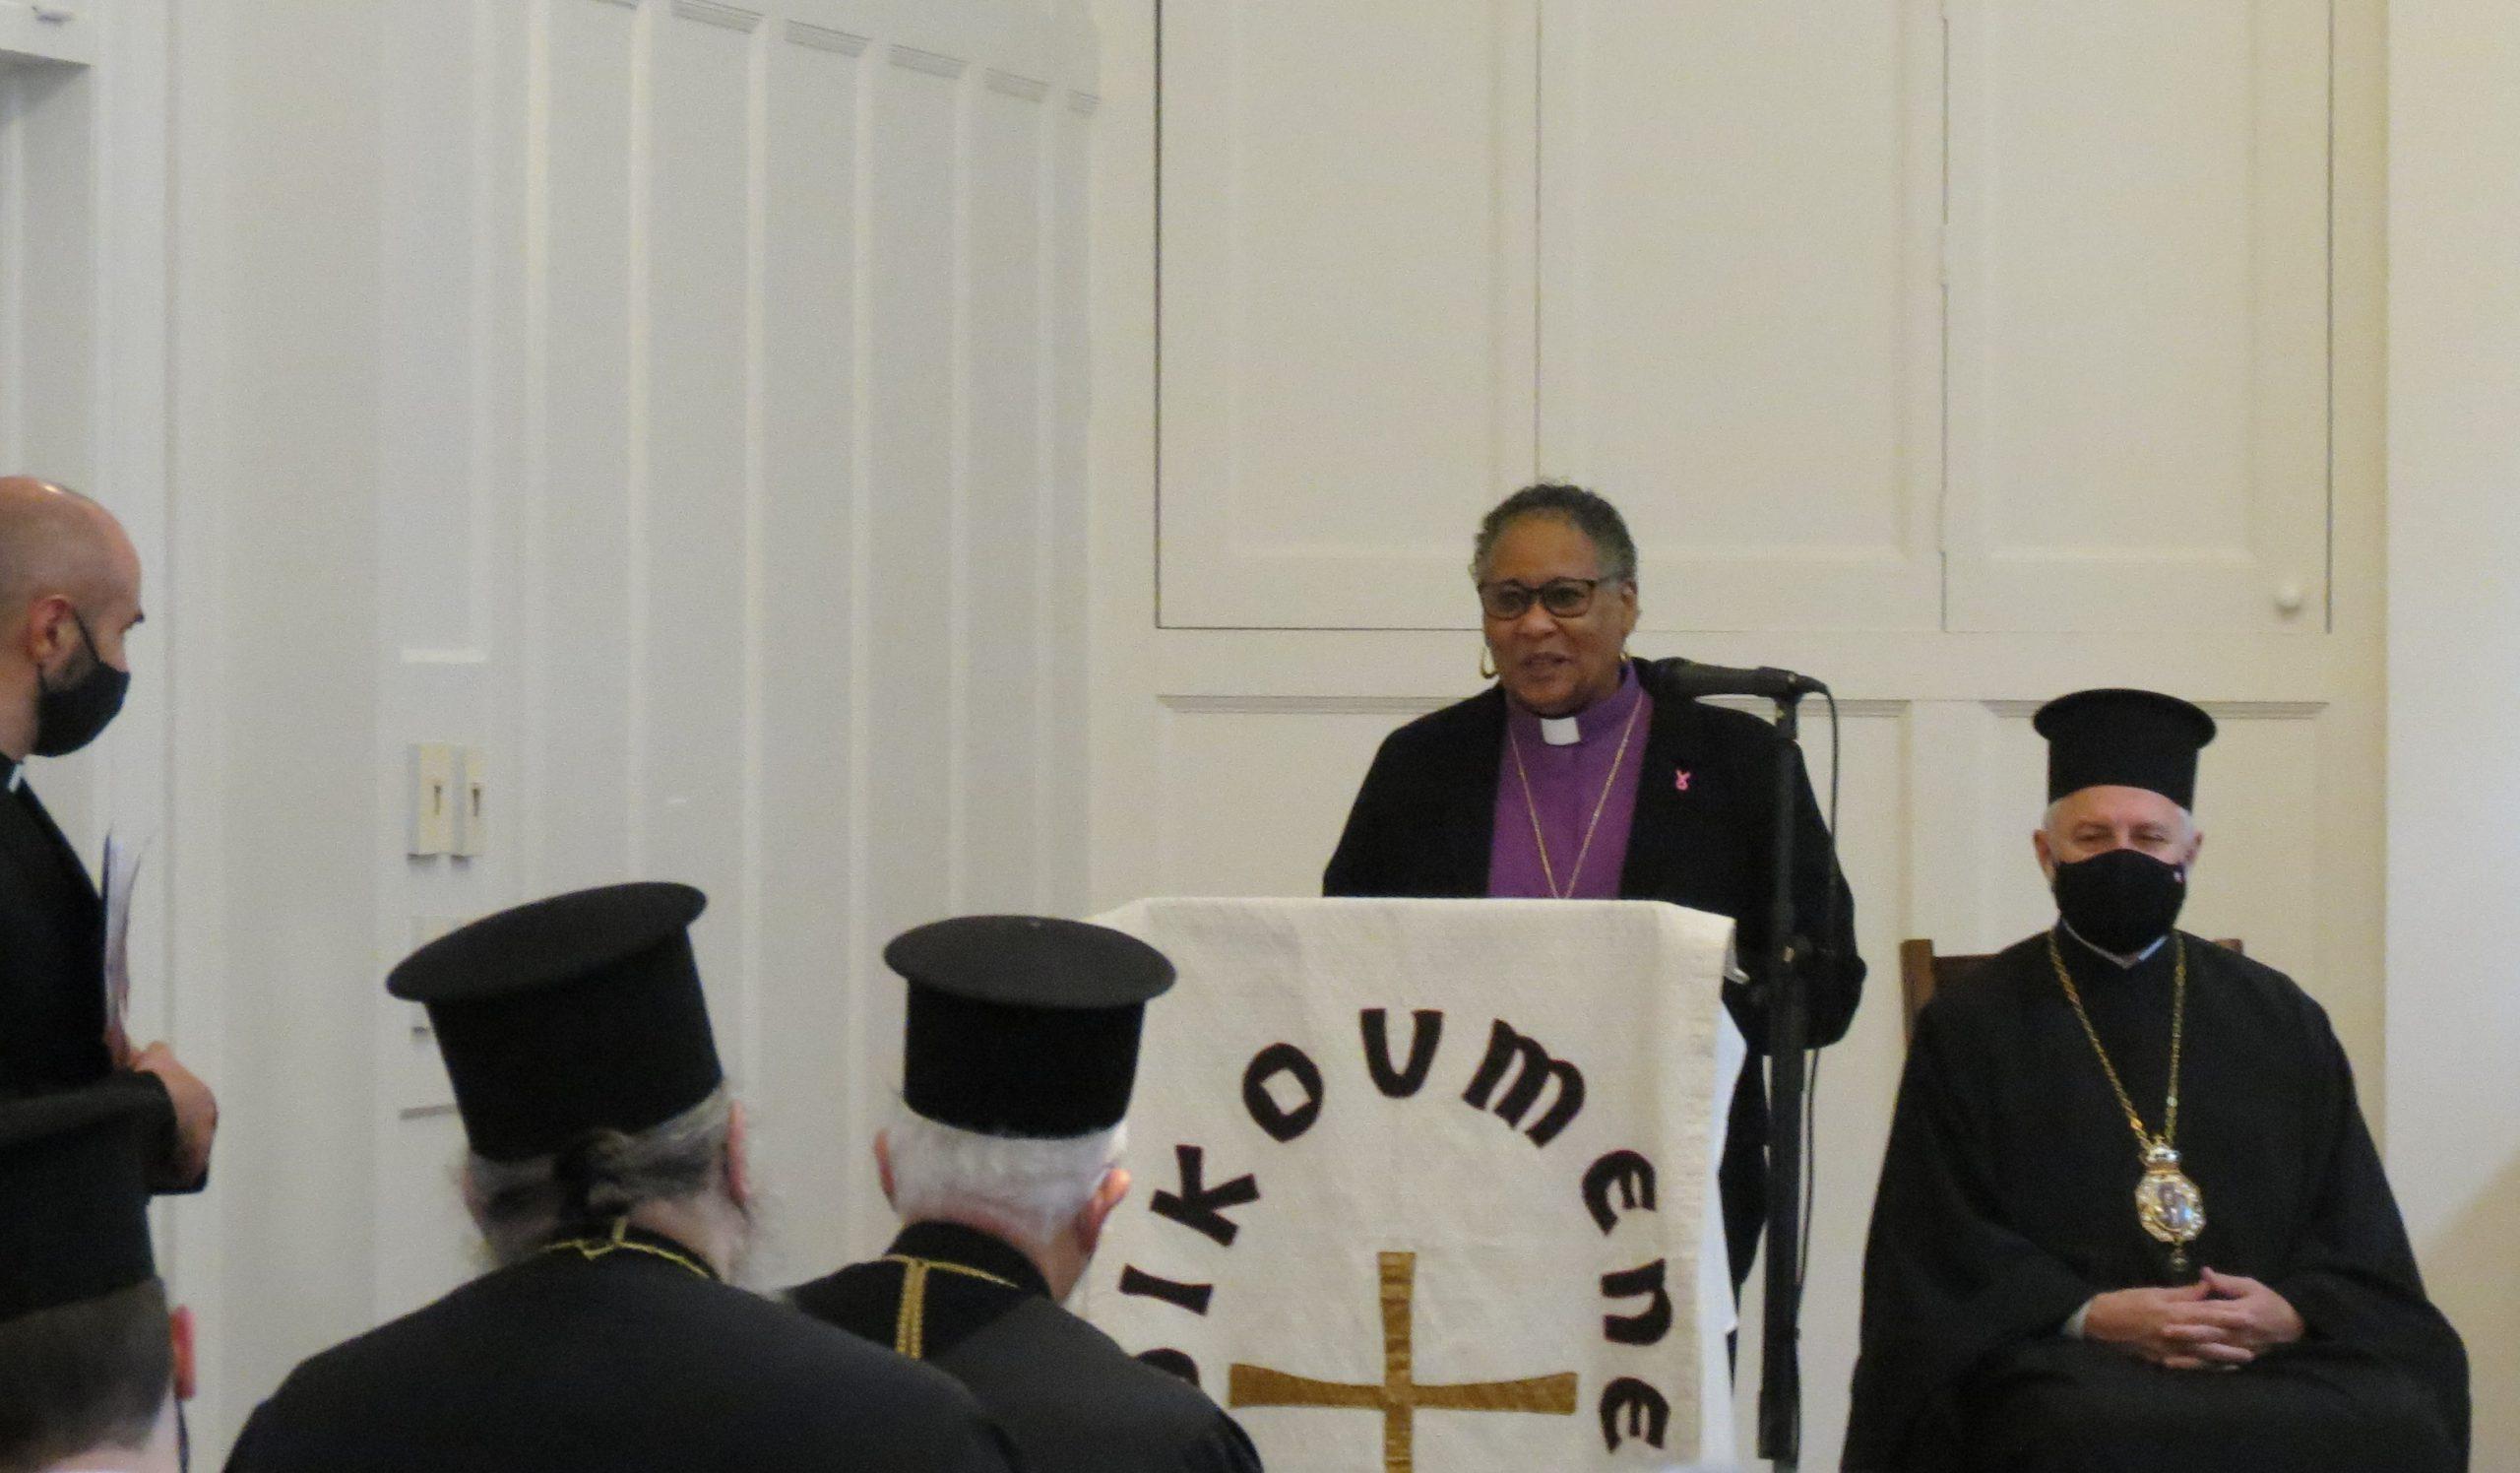 A warm welcome from Bishop Jefferson-Snorton